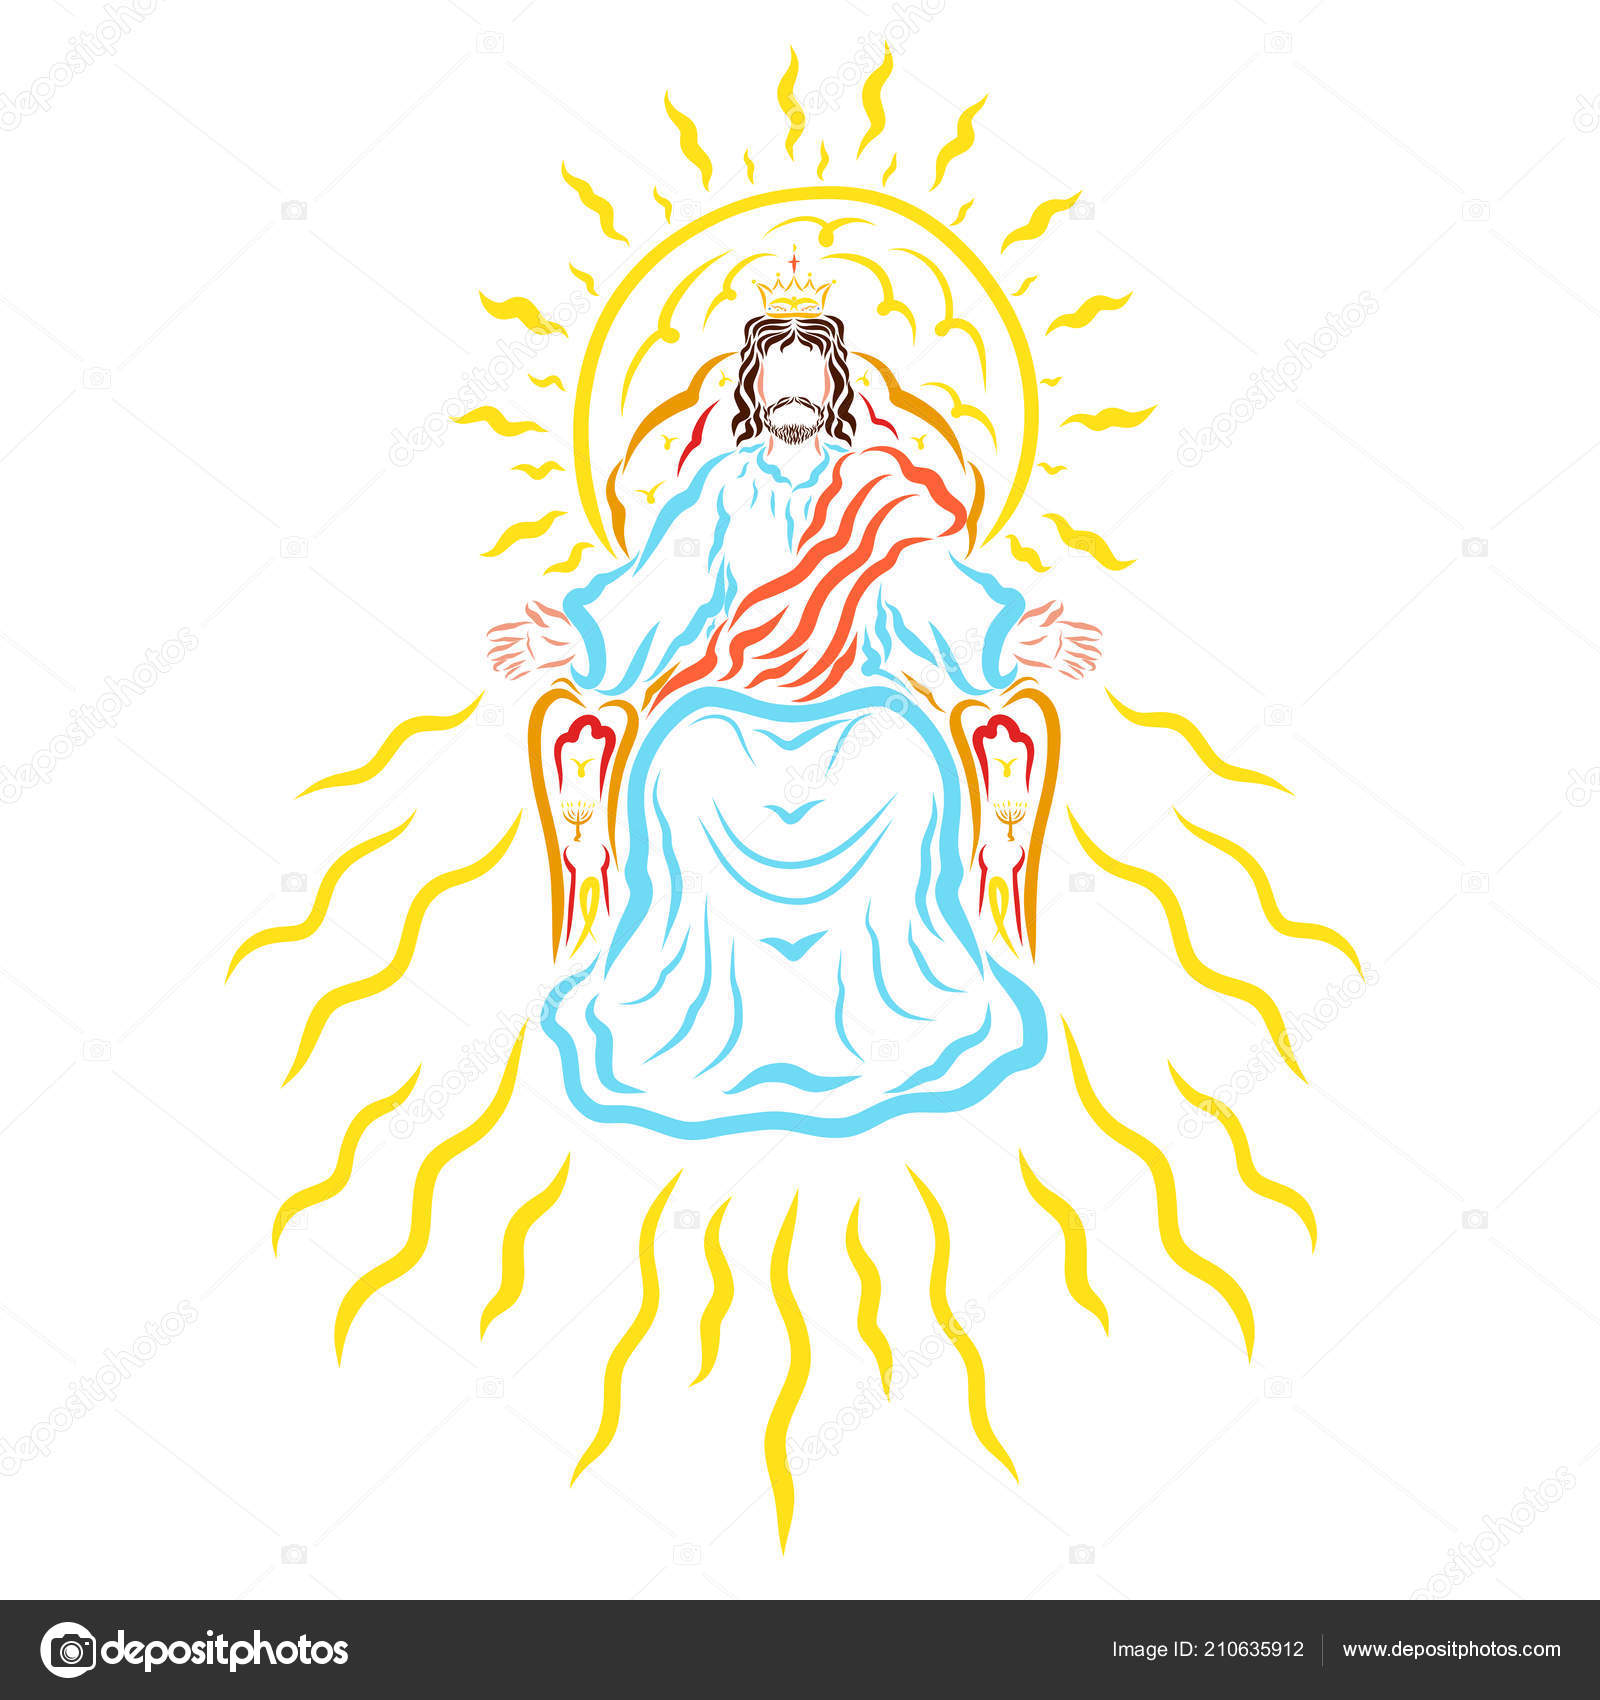 Lord jesus heavenly throne crown sunshine stock photo yuliya4 lord jesus heavenly throne crown sunshine stock photo thecheapjerseys Image collections